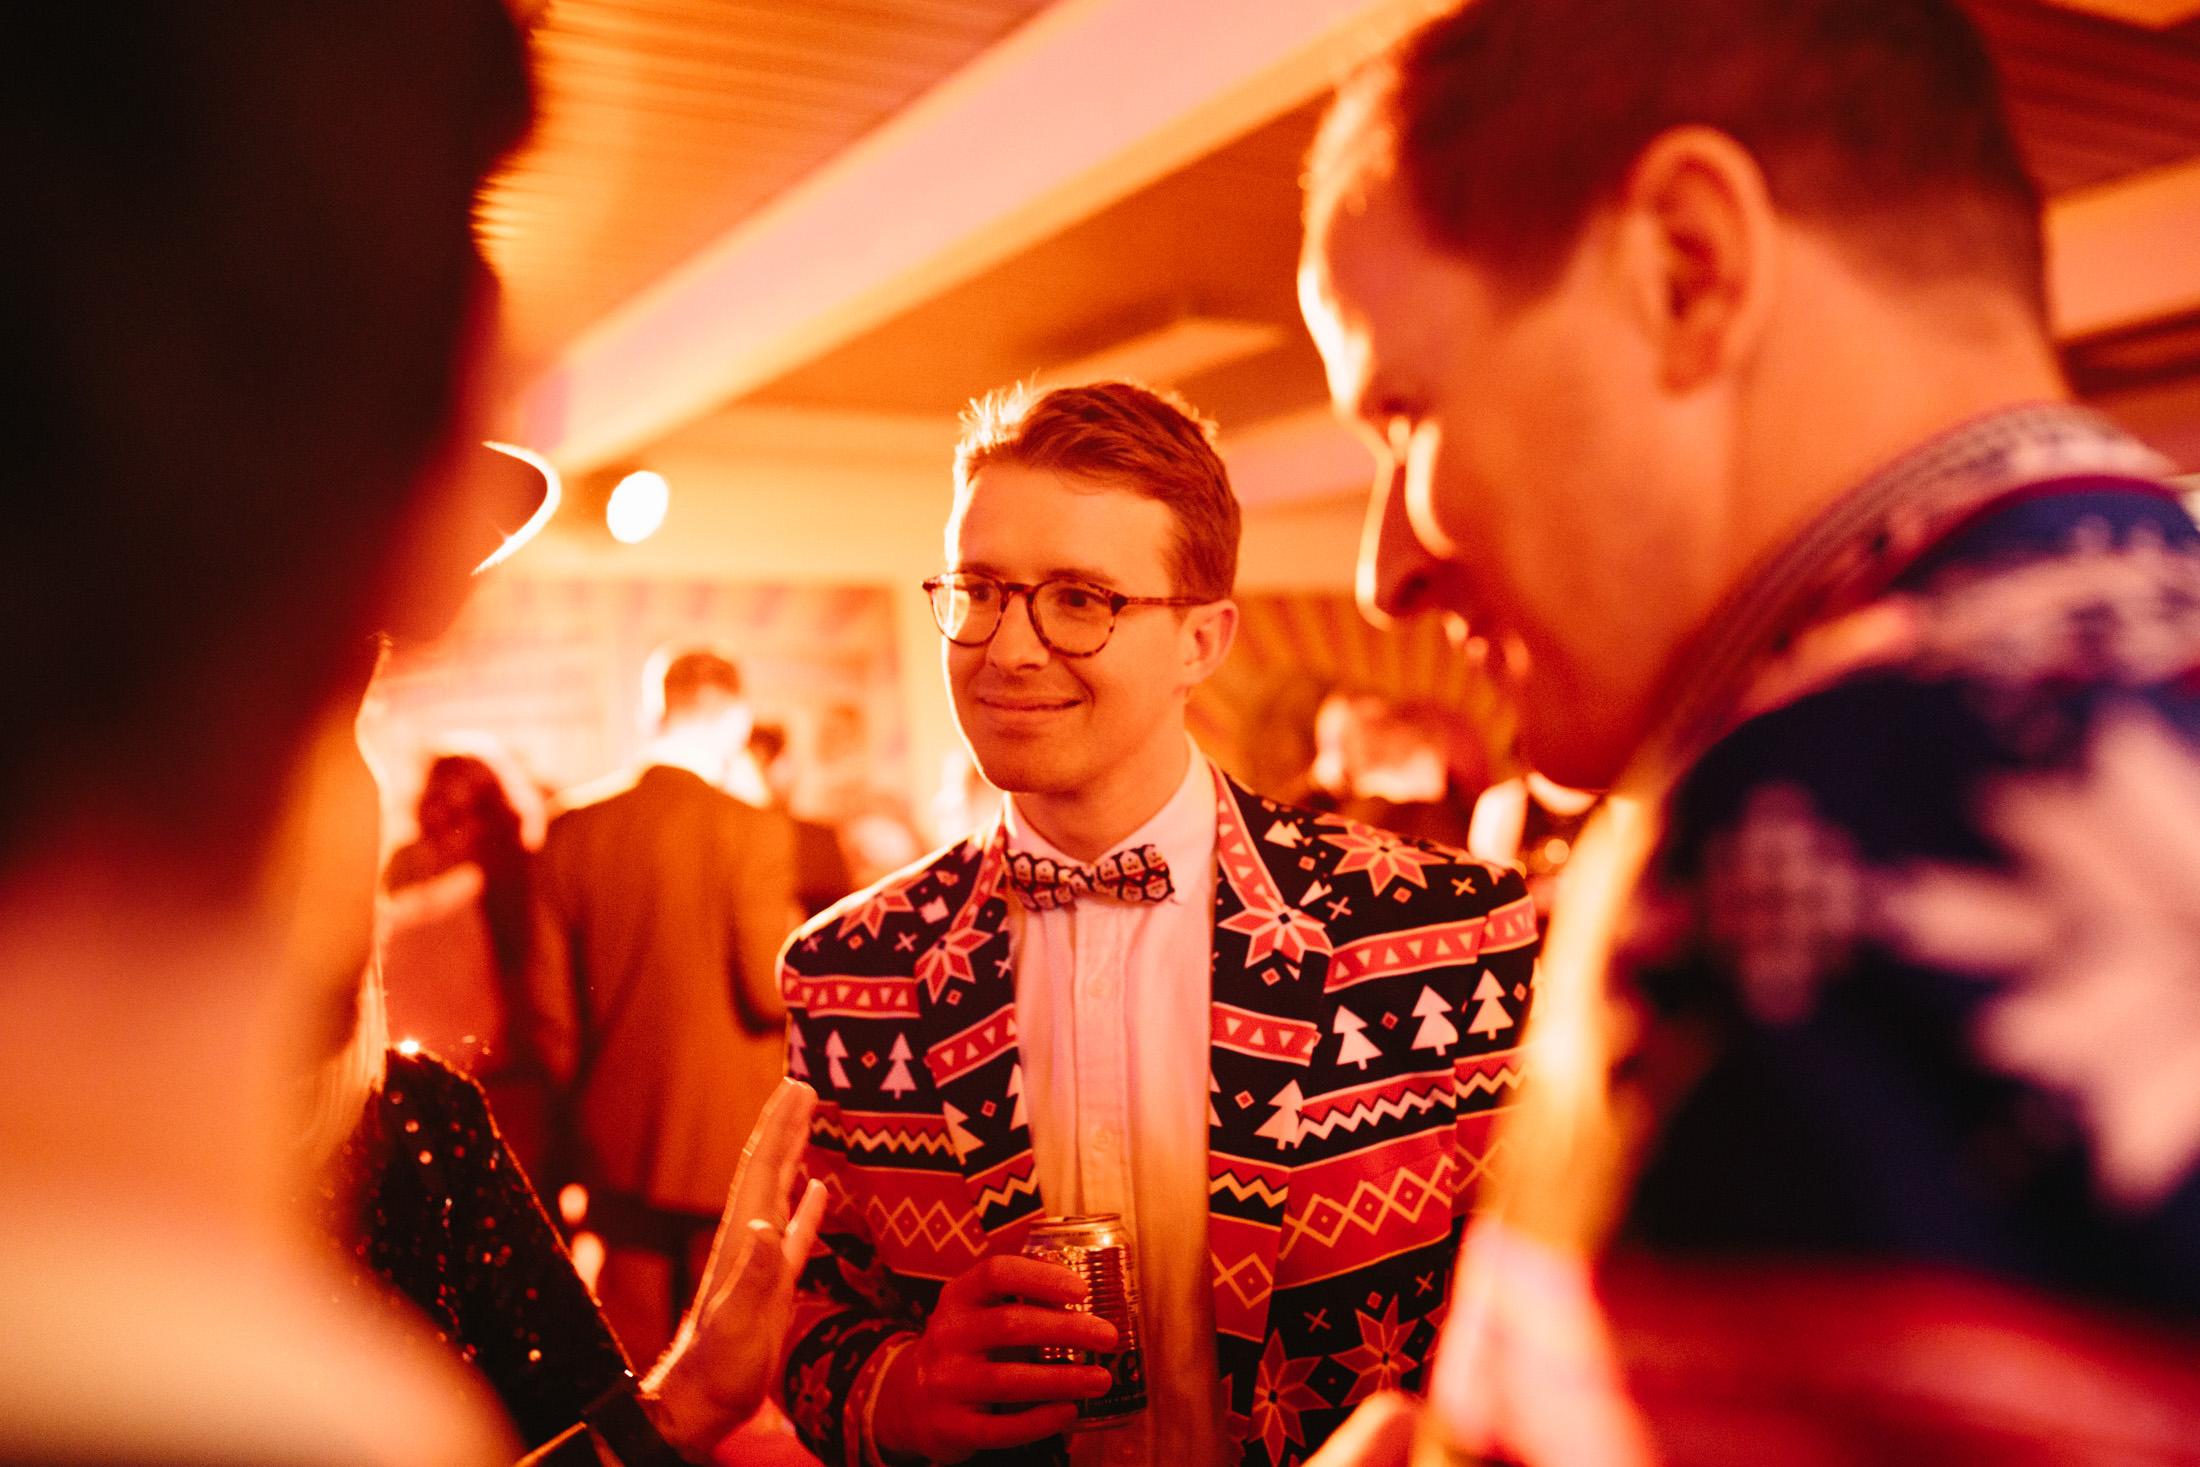 AL-event-photographer-london-4.jpg